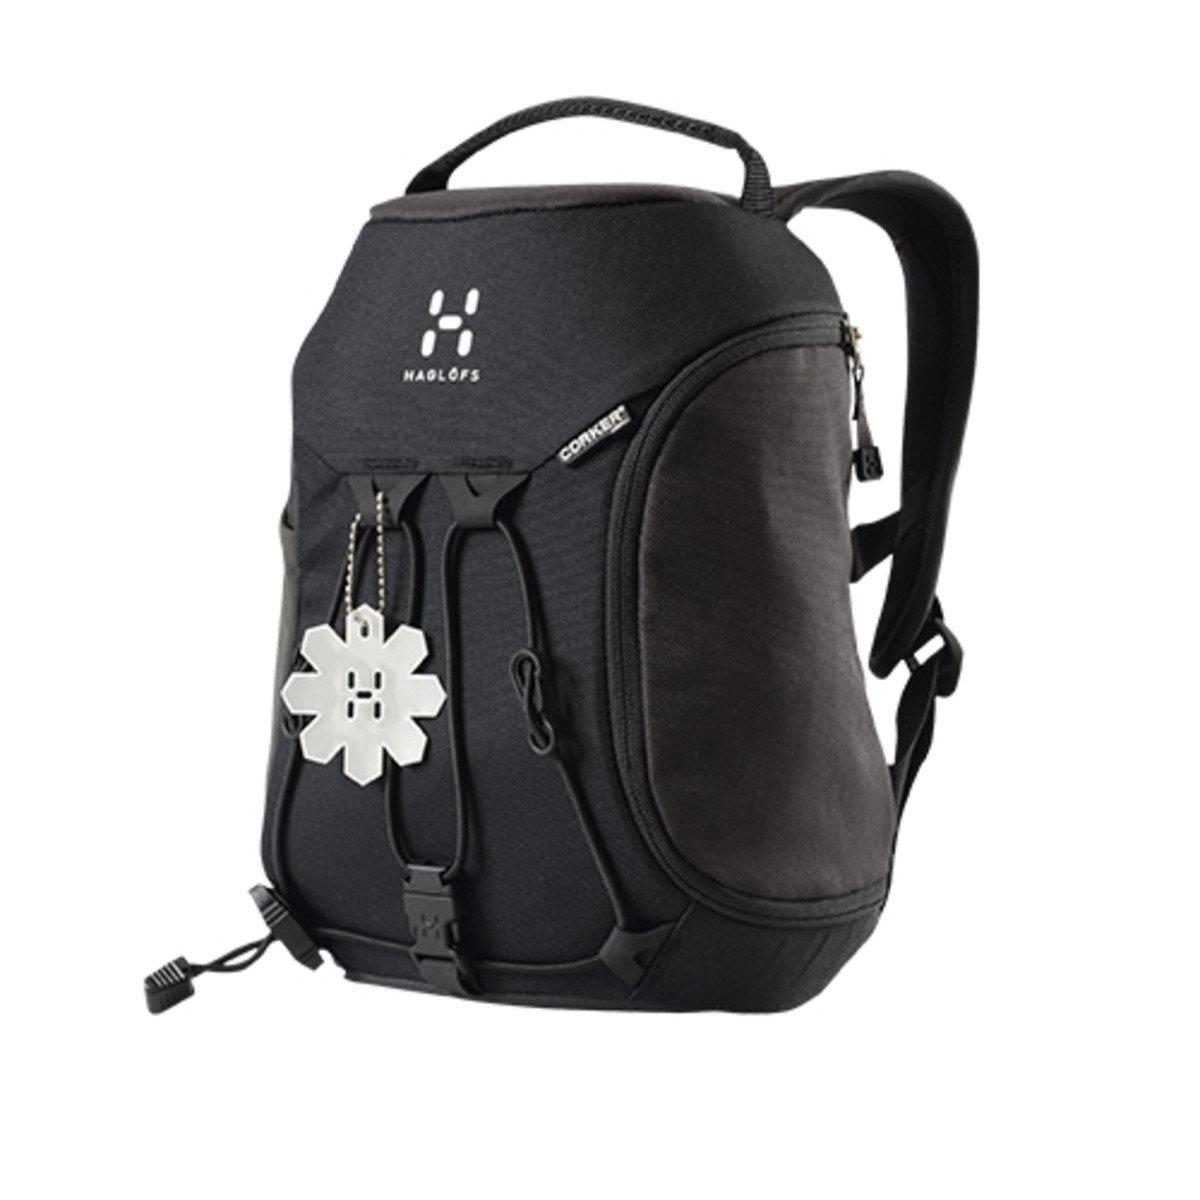 Corker XS-Black/Charcoal-339220